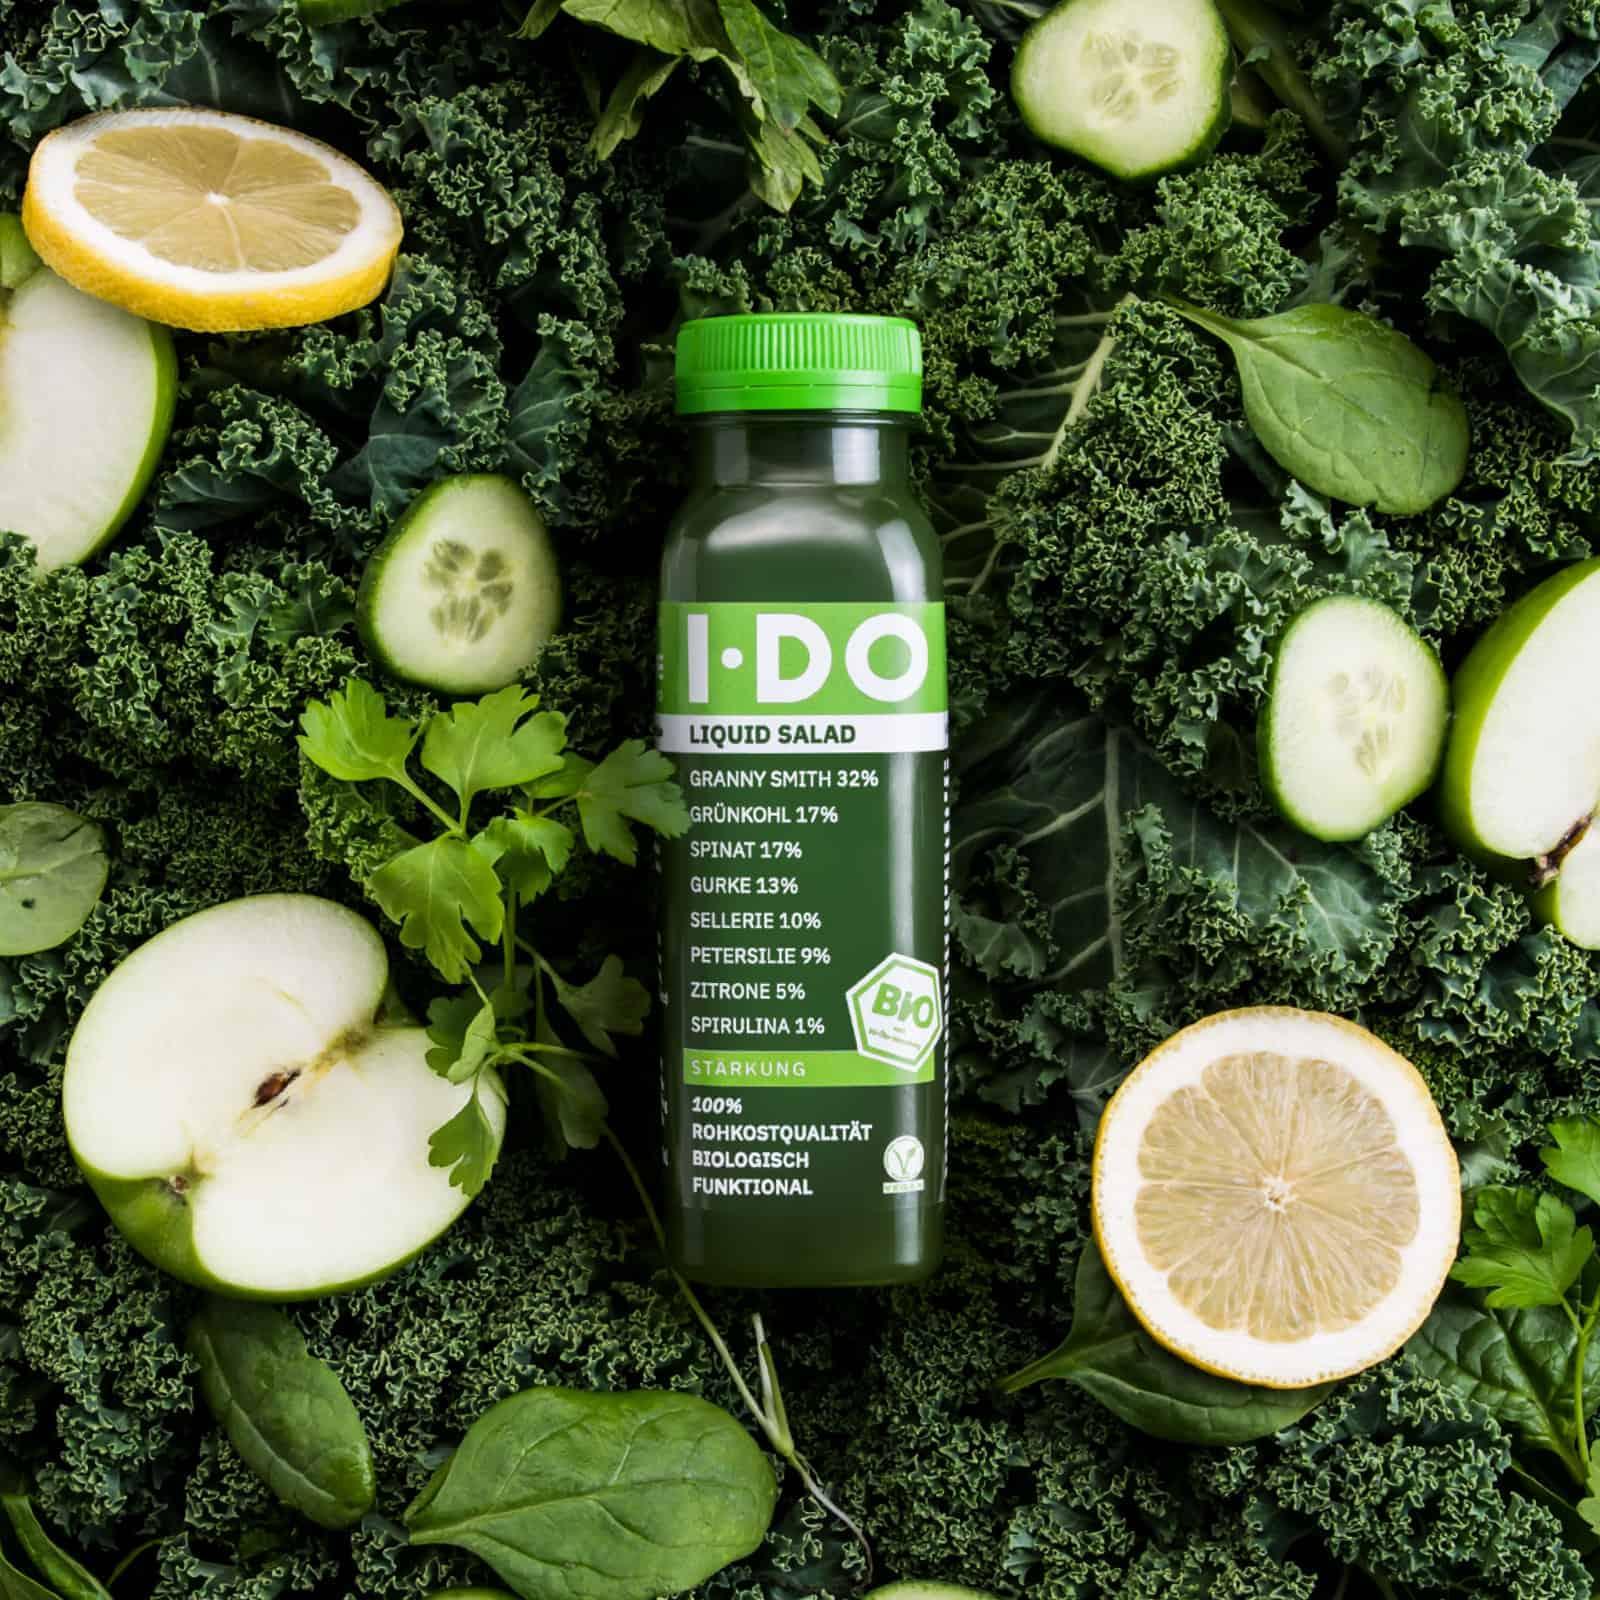 IDO Liquid Salad, Biosaft in Rohkostqualität